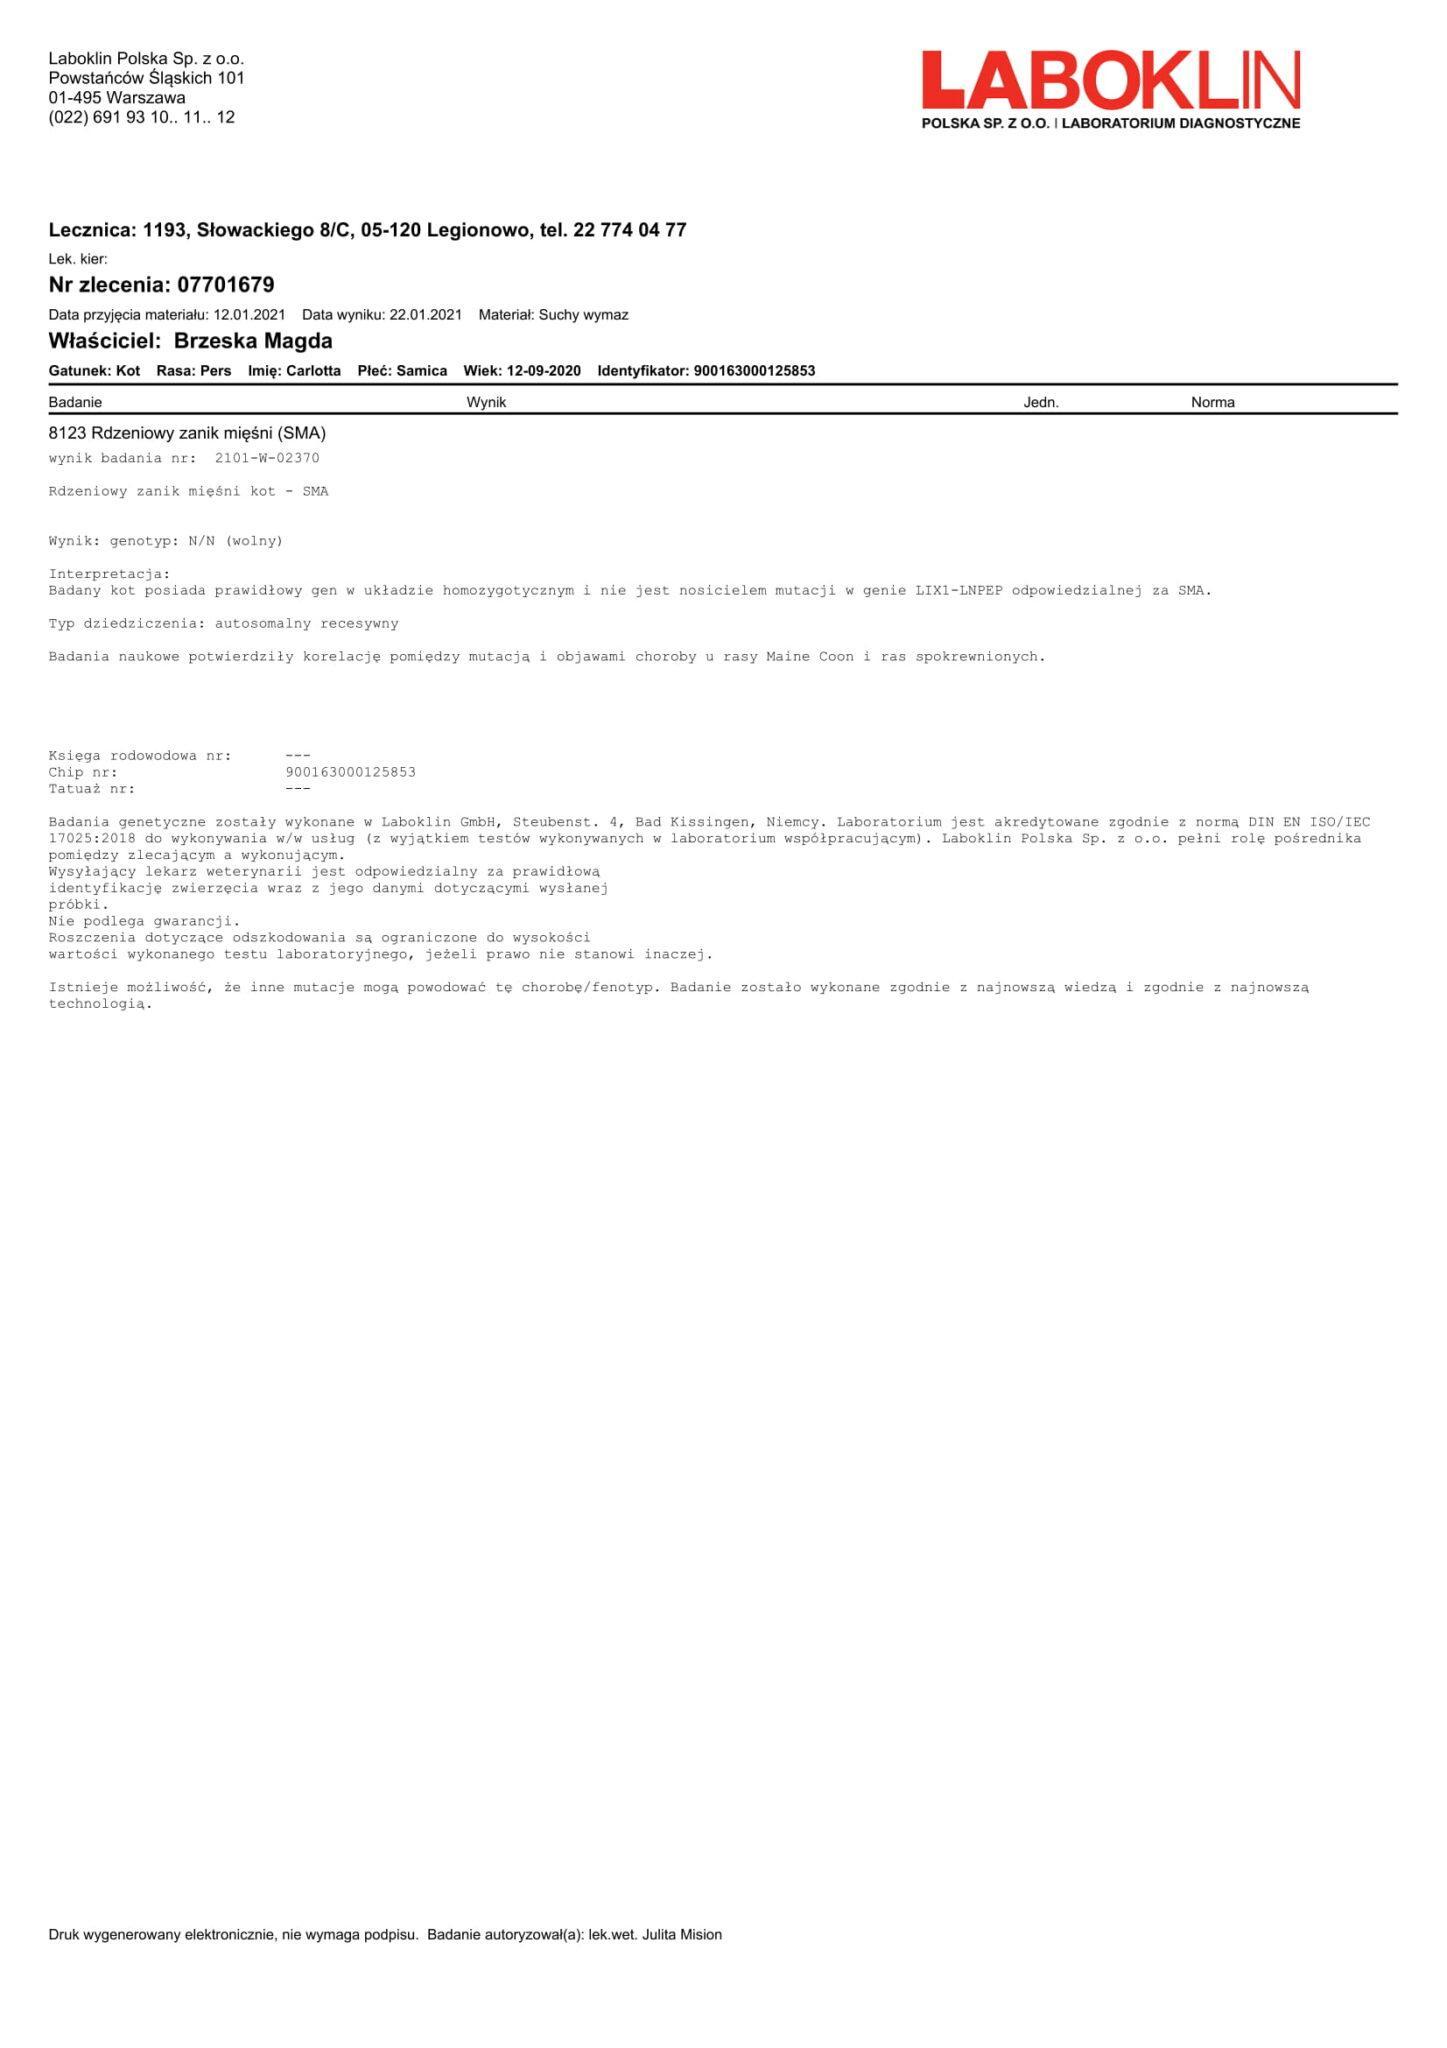 Brzeska-Magda-07701679-22.01.2021-1_6-6-1 Breeding